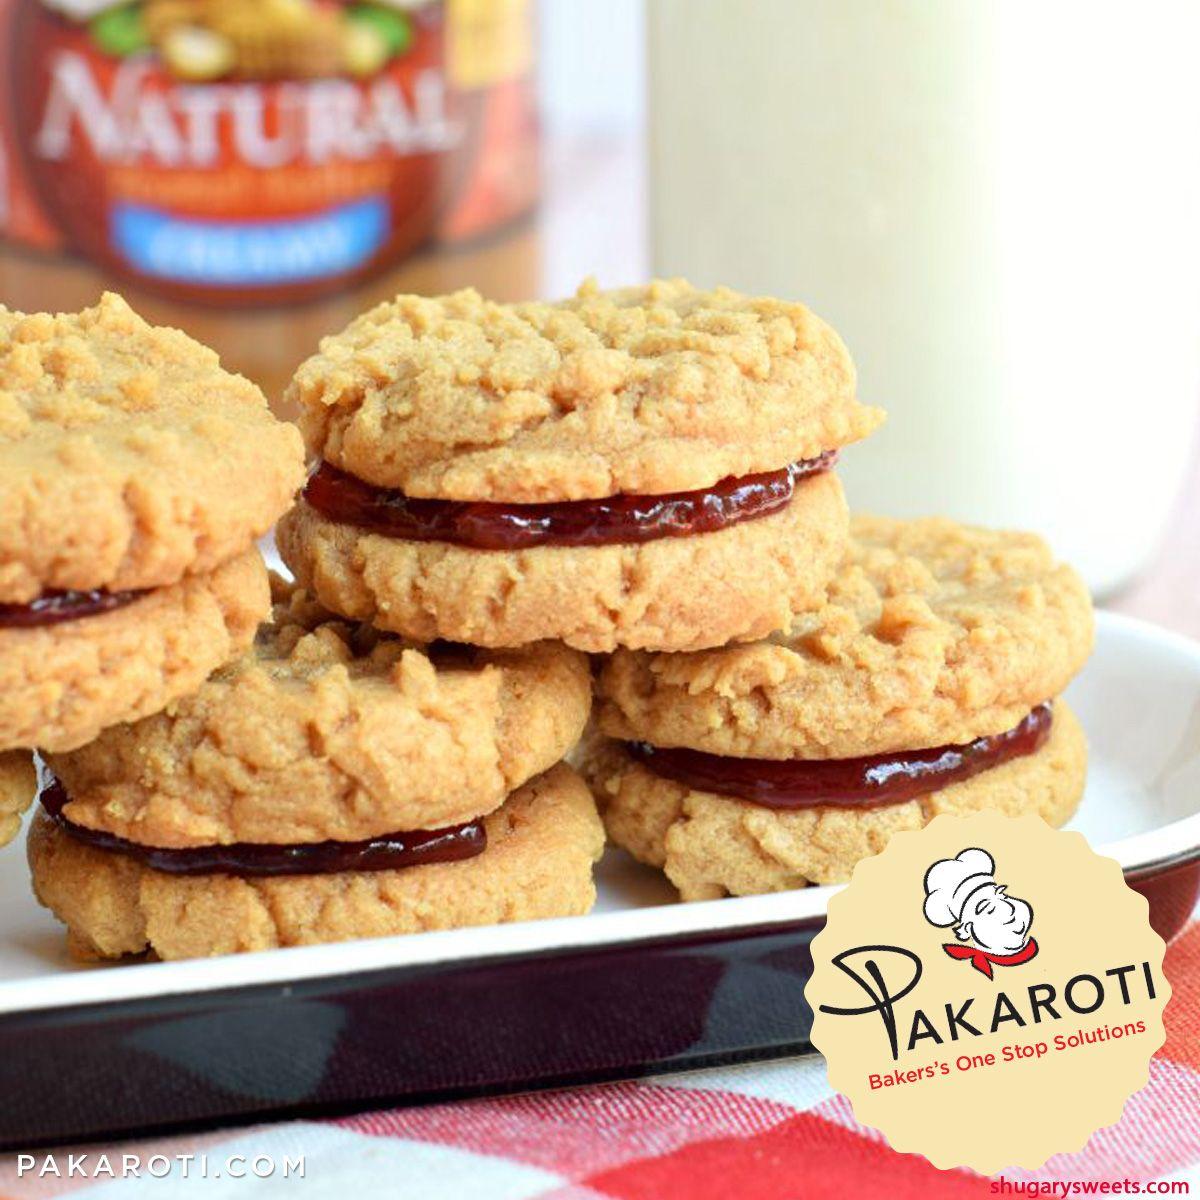 Cookies Dengan Selai Kacang Mungkin Sudah Biasa Namun Bagaimana Dengan Jelly Didalamnya Peanut Butter And Jelly Sandwich Cookies Me Selai Kacang Sandwich Kue